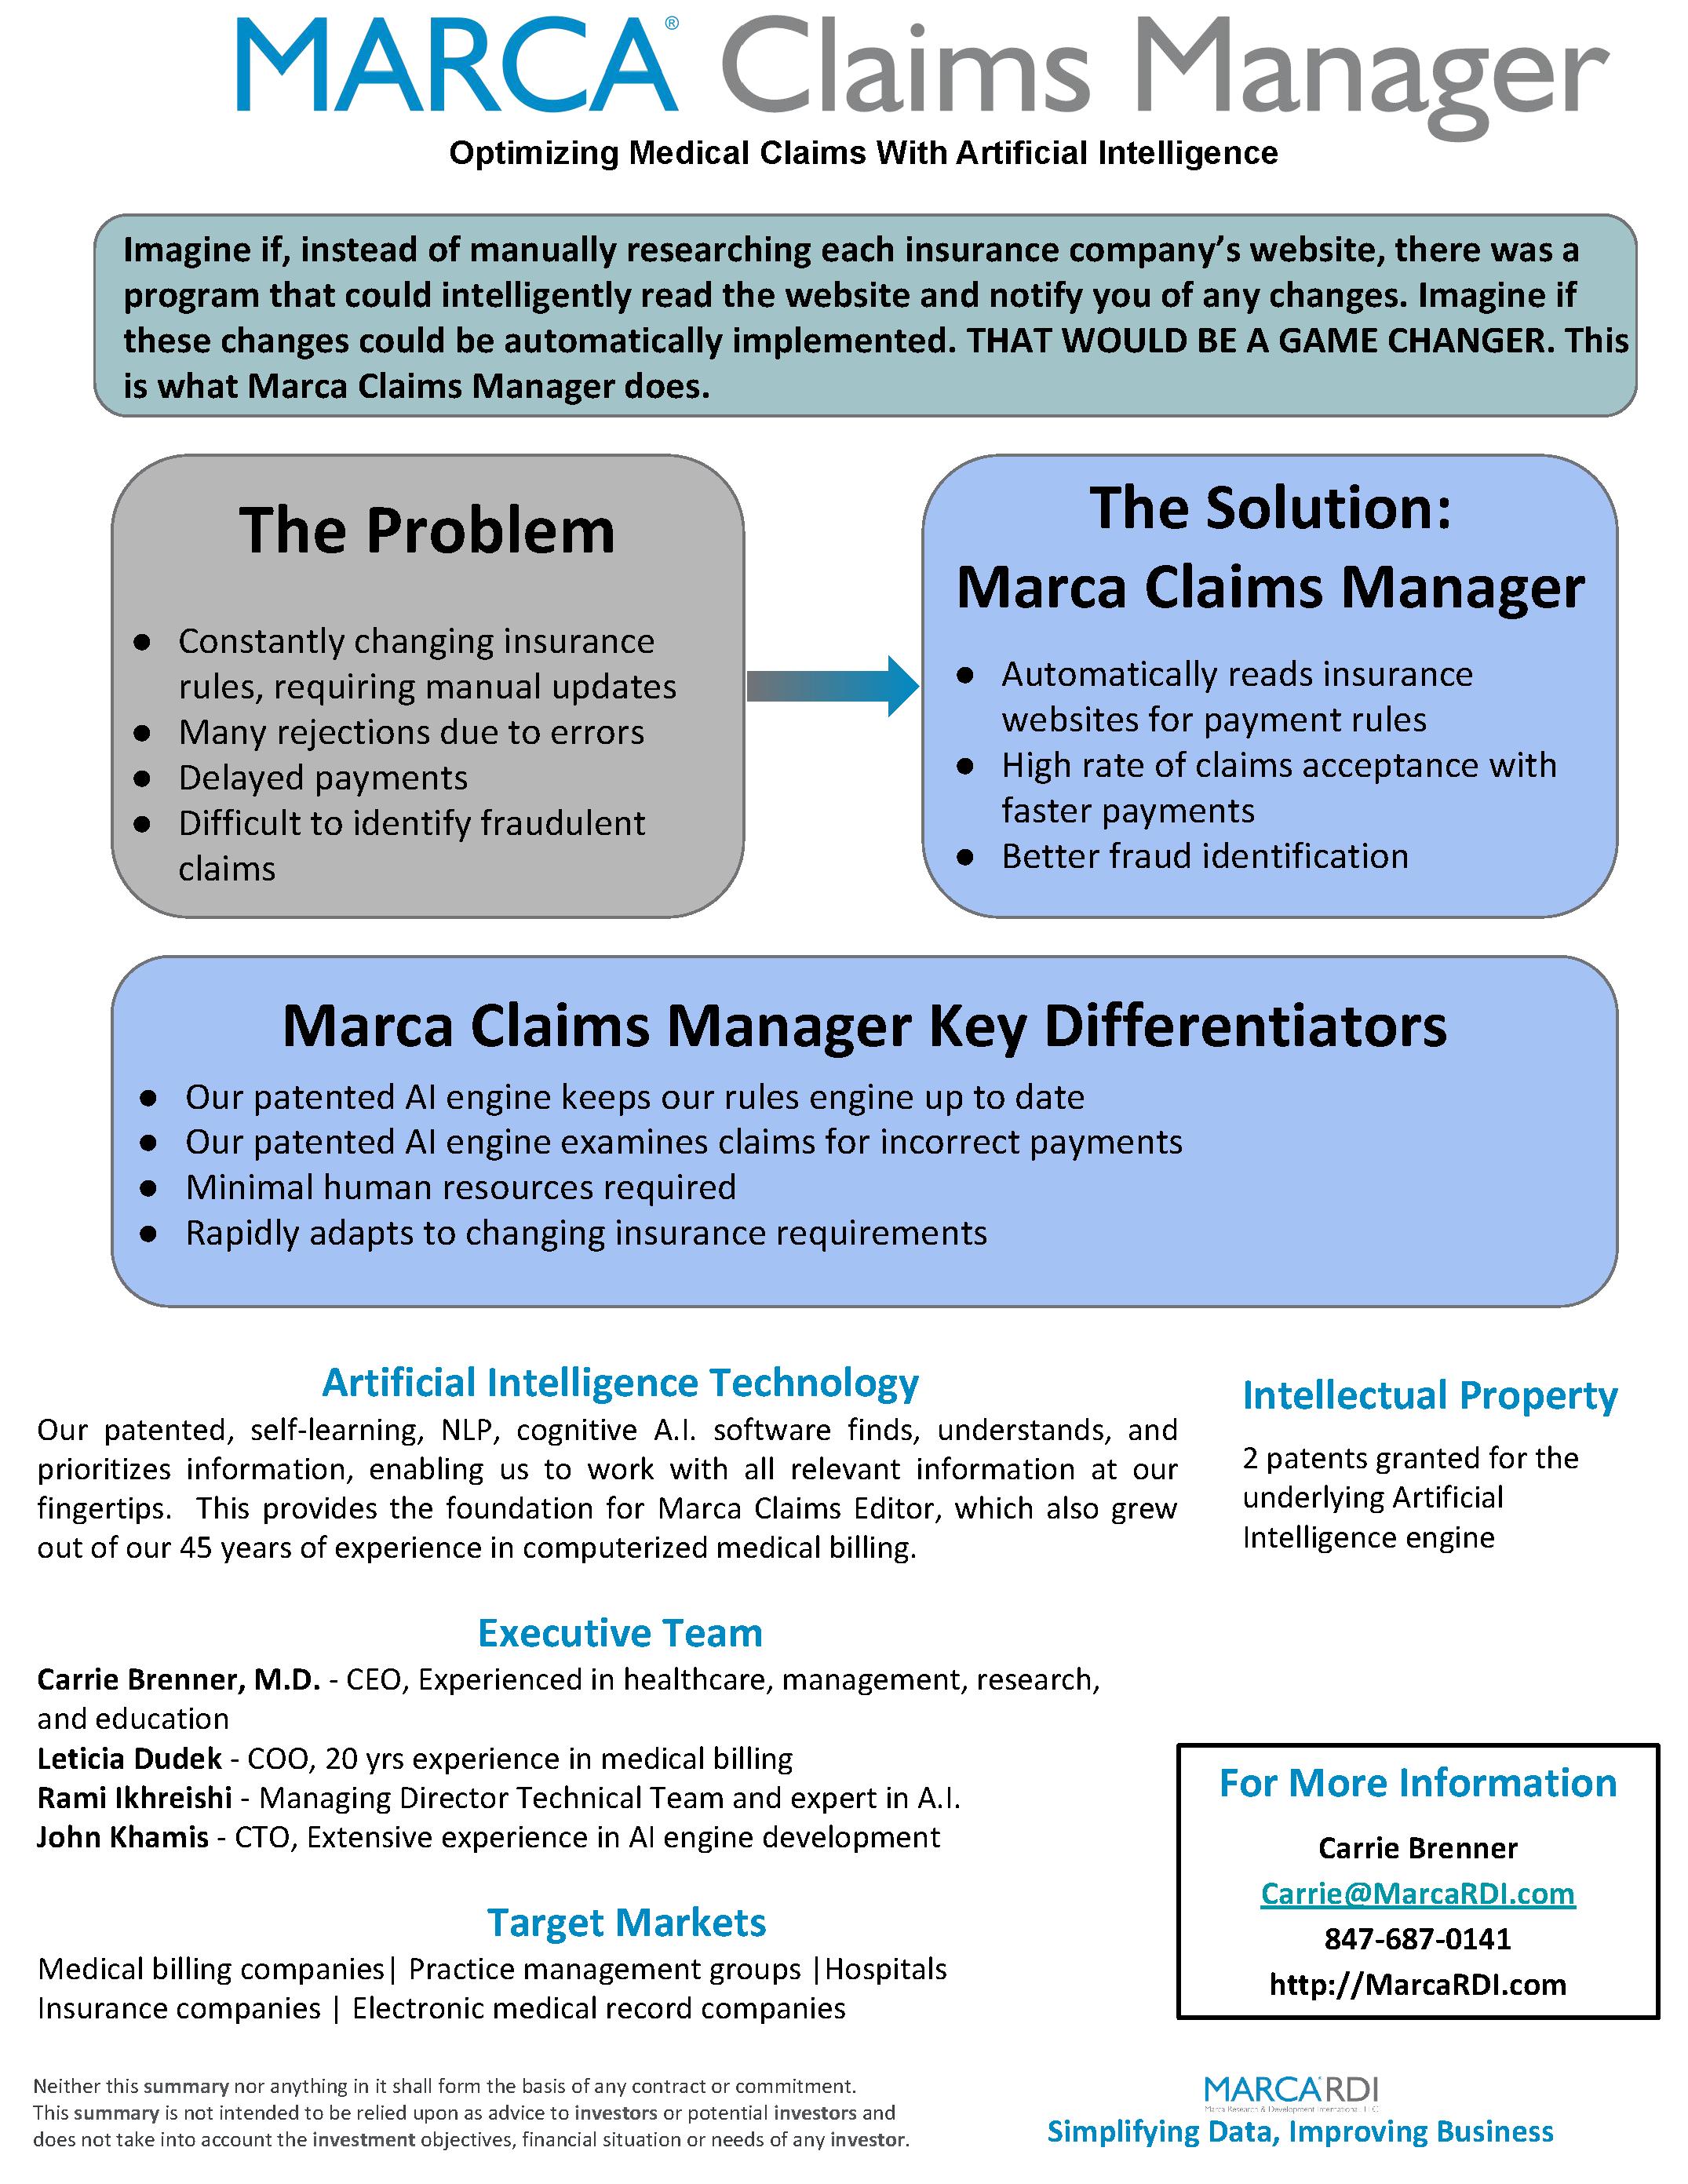 Marca RDI - one sheet summary June 2020 (1)